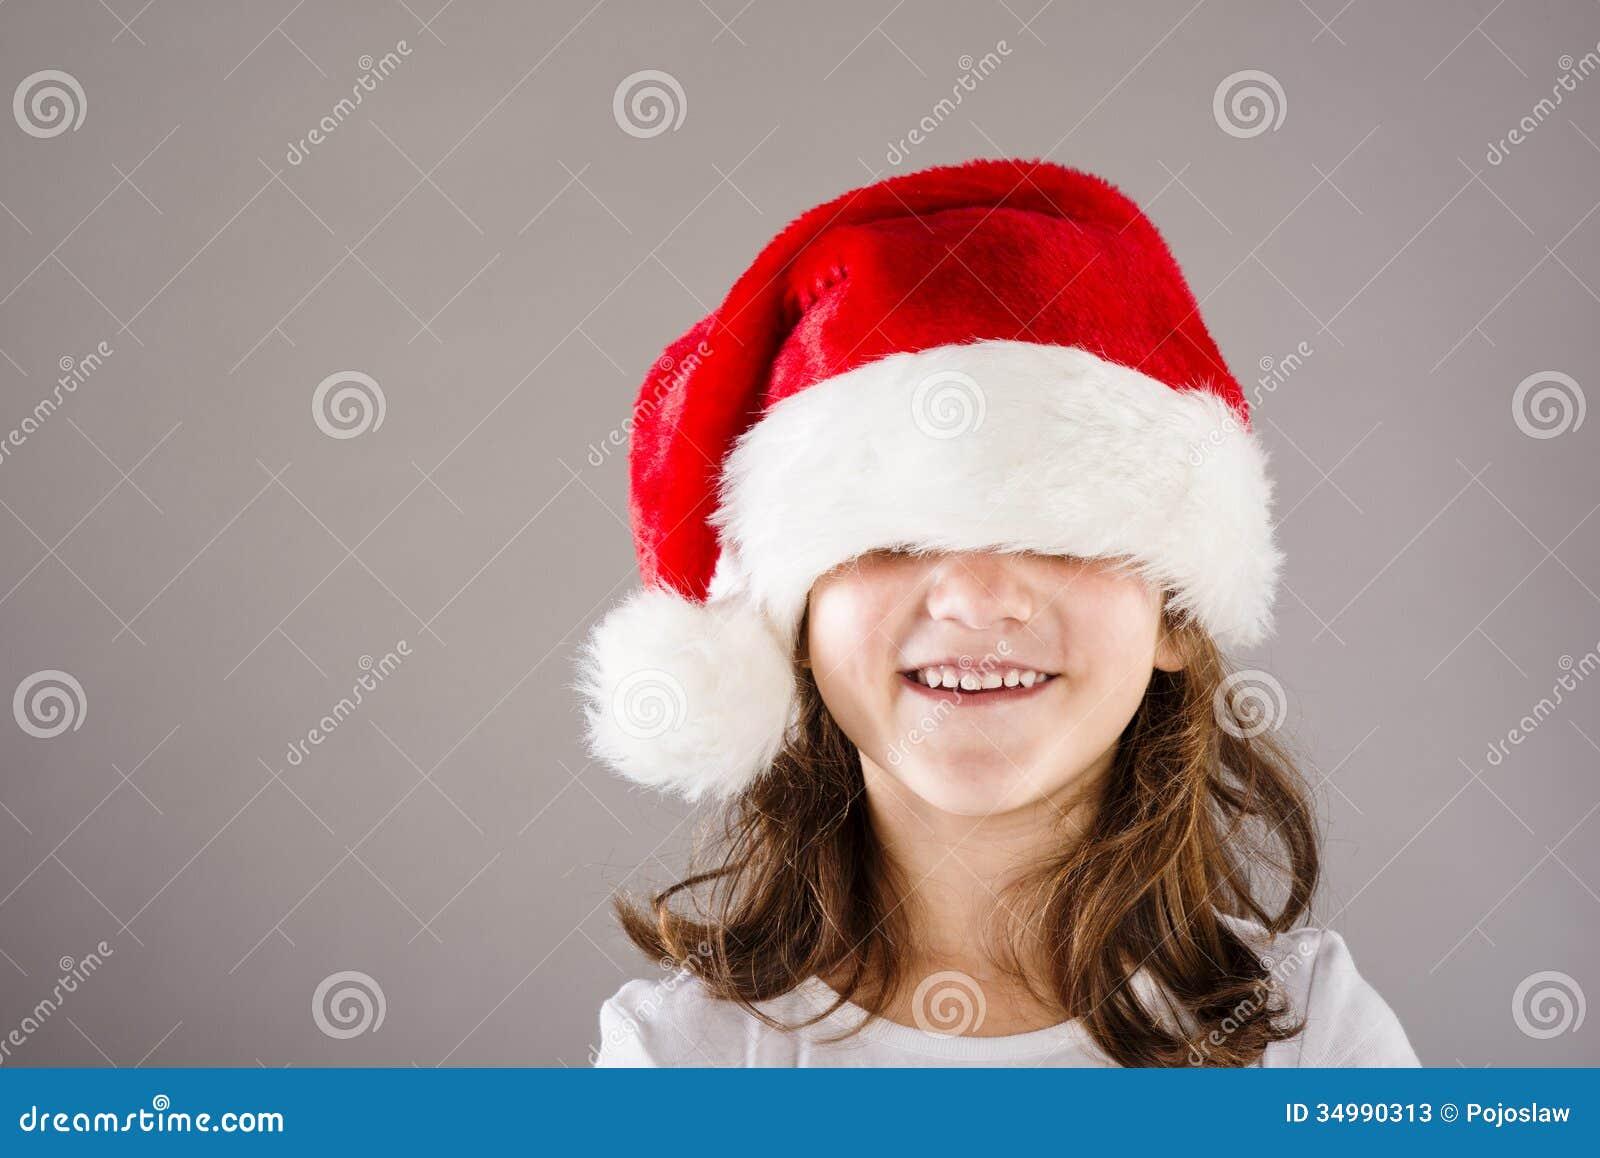 how to make a small santa hat